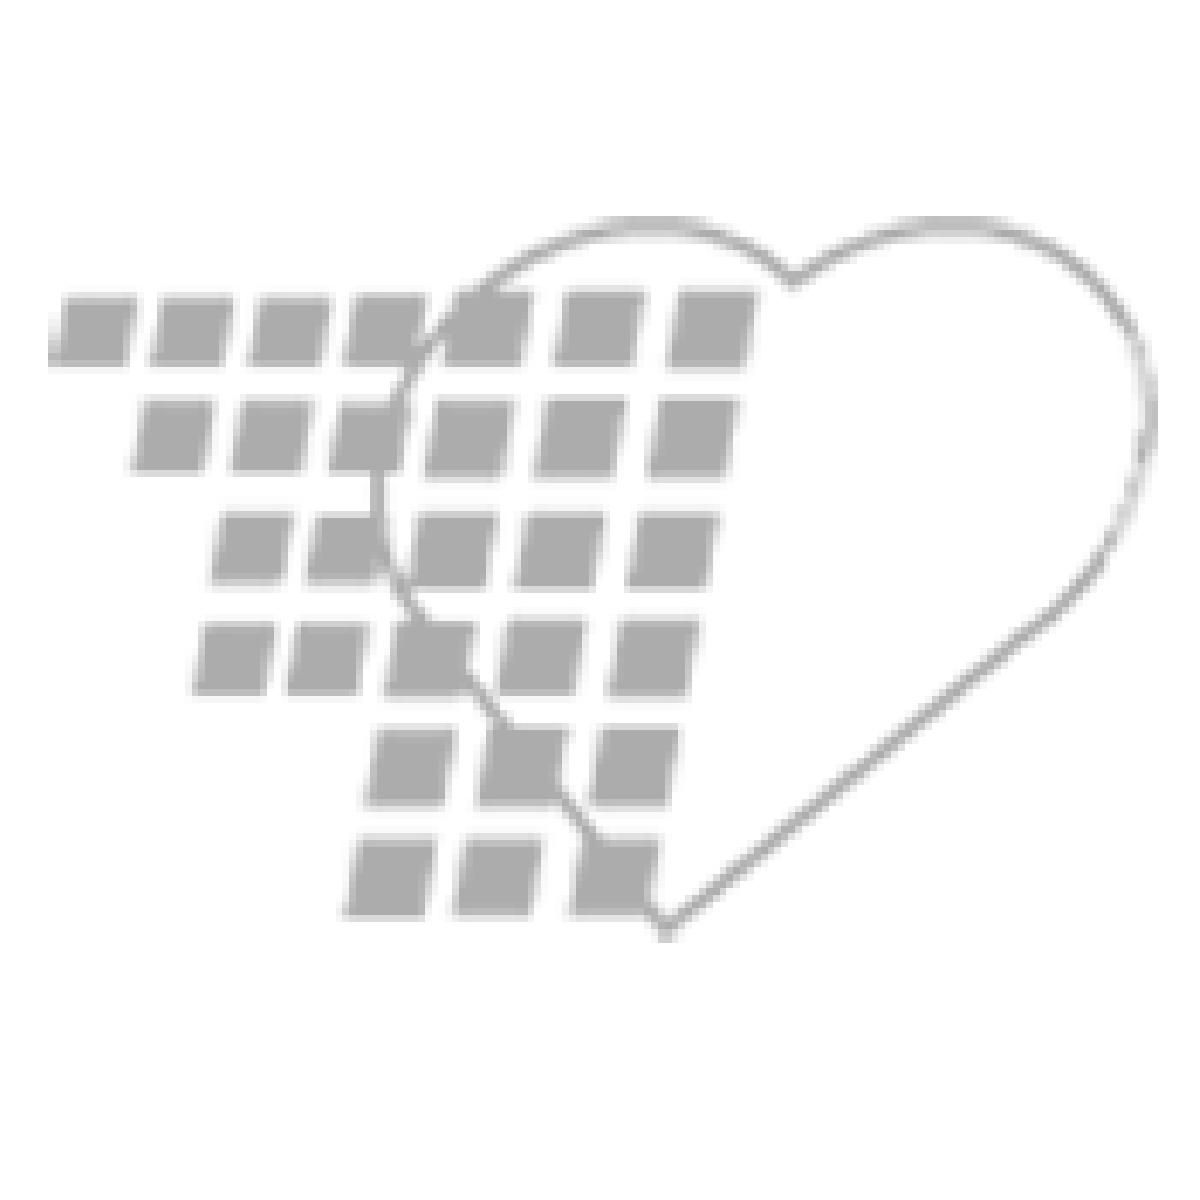 06-93-6948 - Demo Dose® EPINEPHrin (Adrenalin) Injection 30mL 1mg/mL